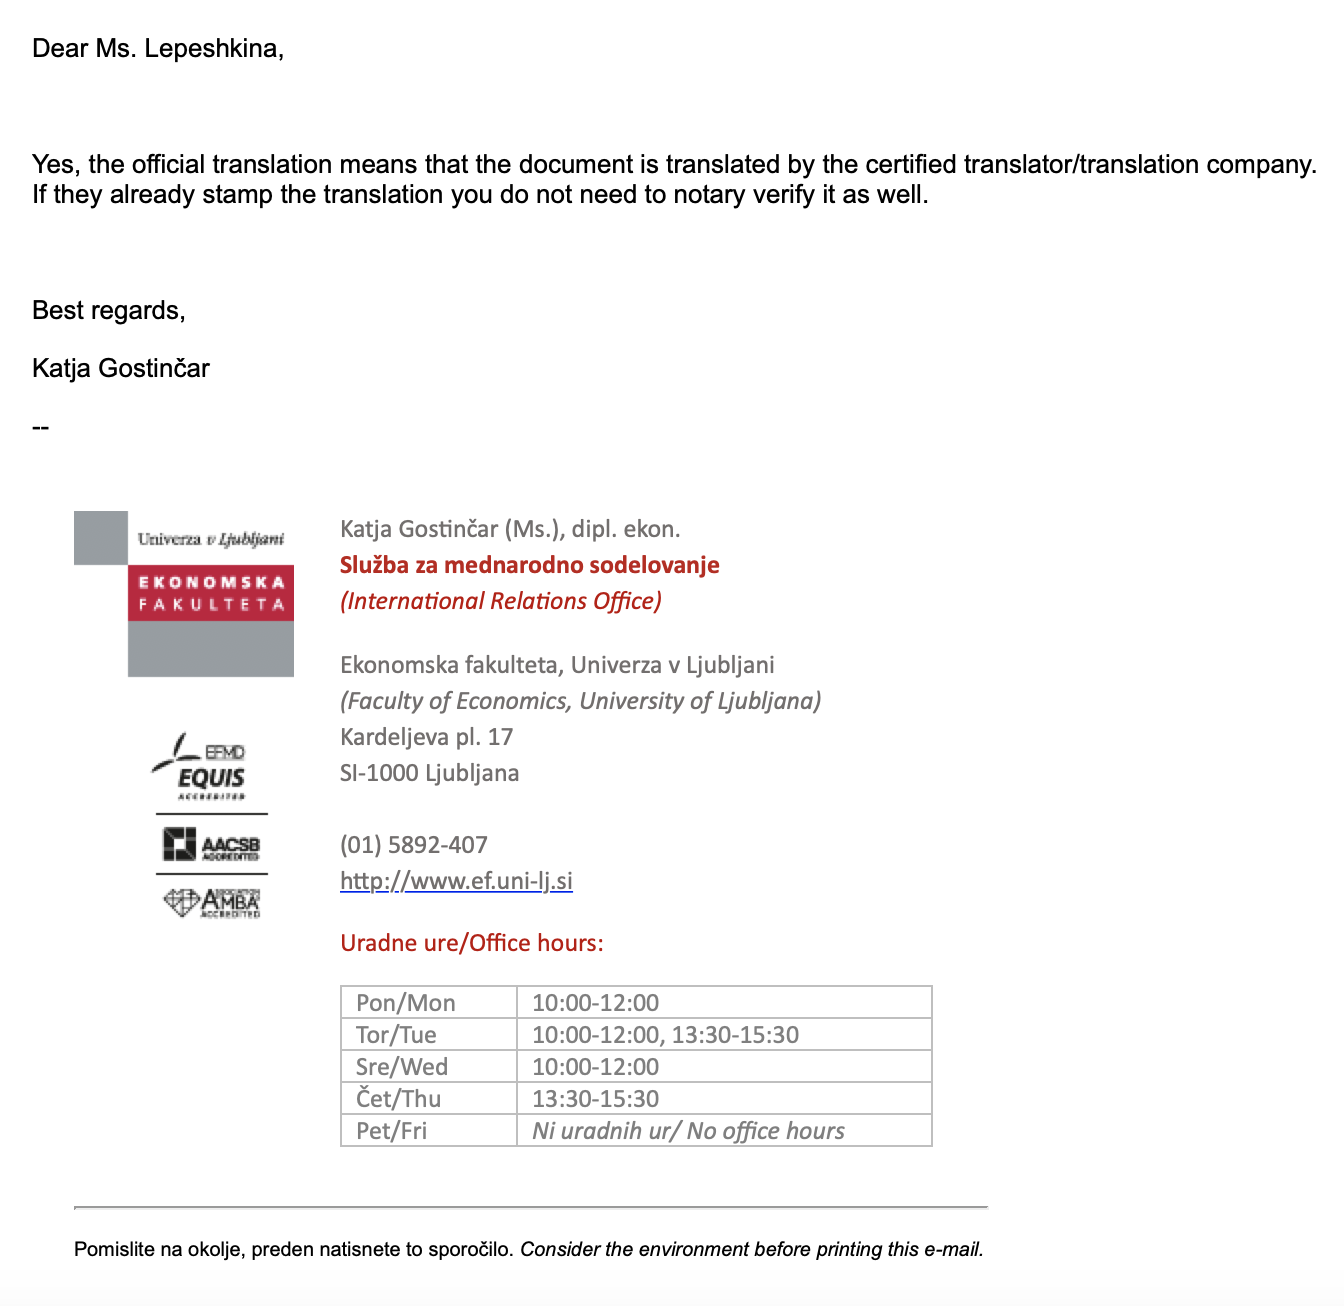 Письмо, в котором сотрудник факультета объясняет про заверение перевода